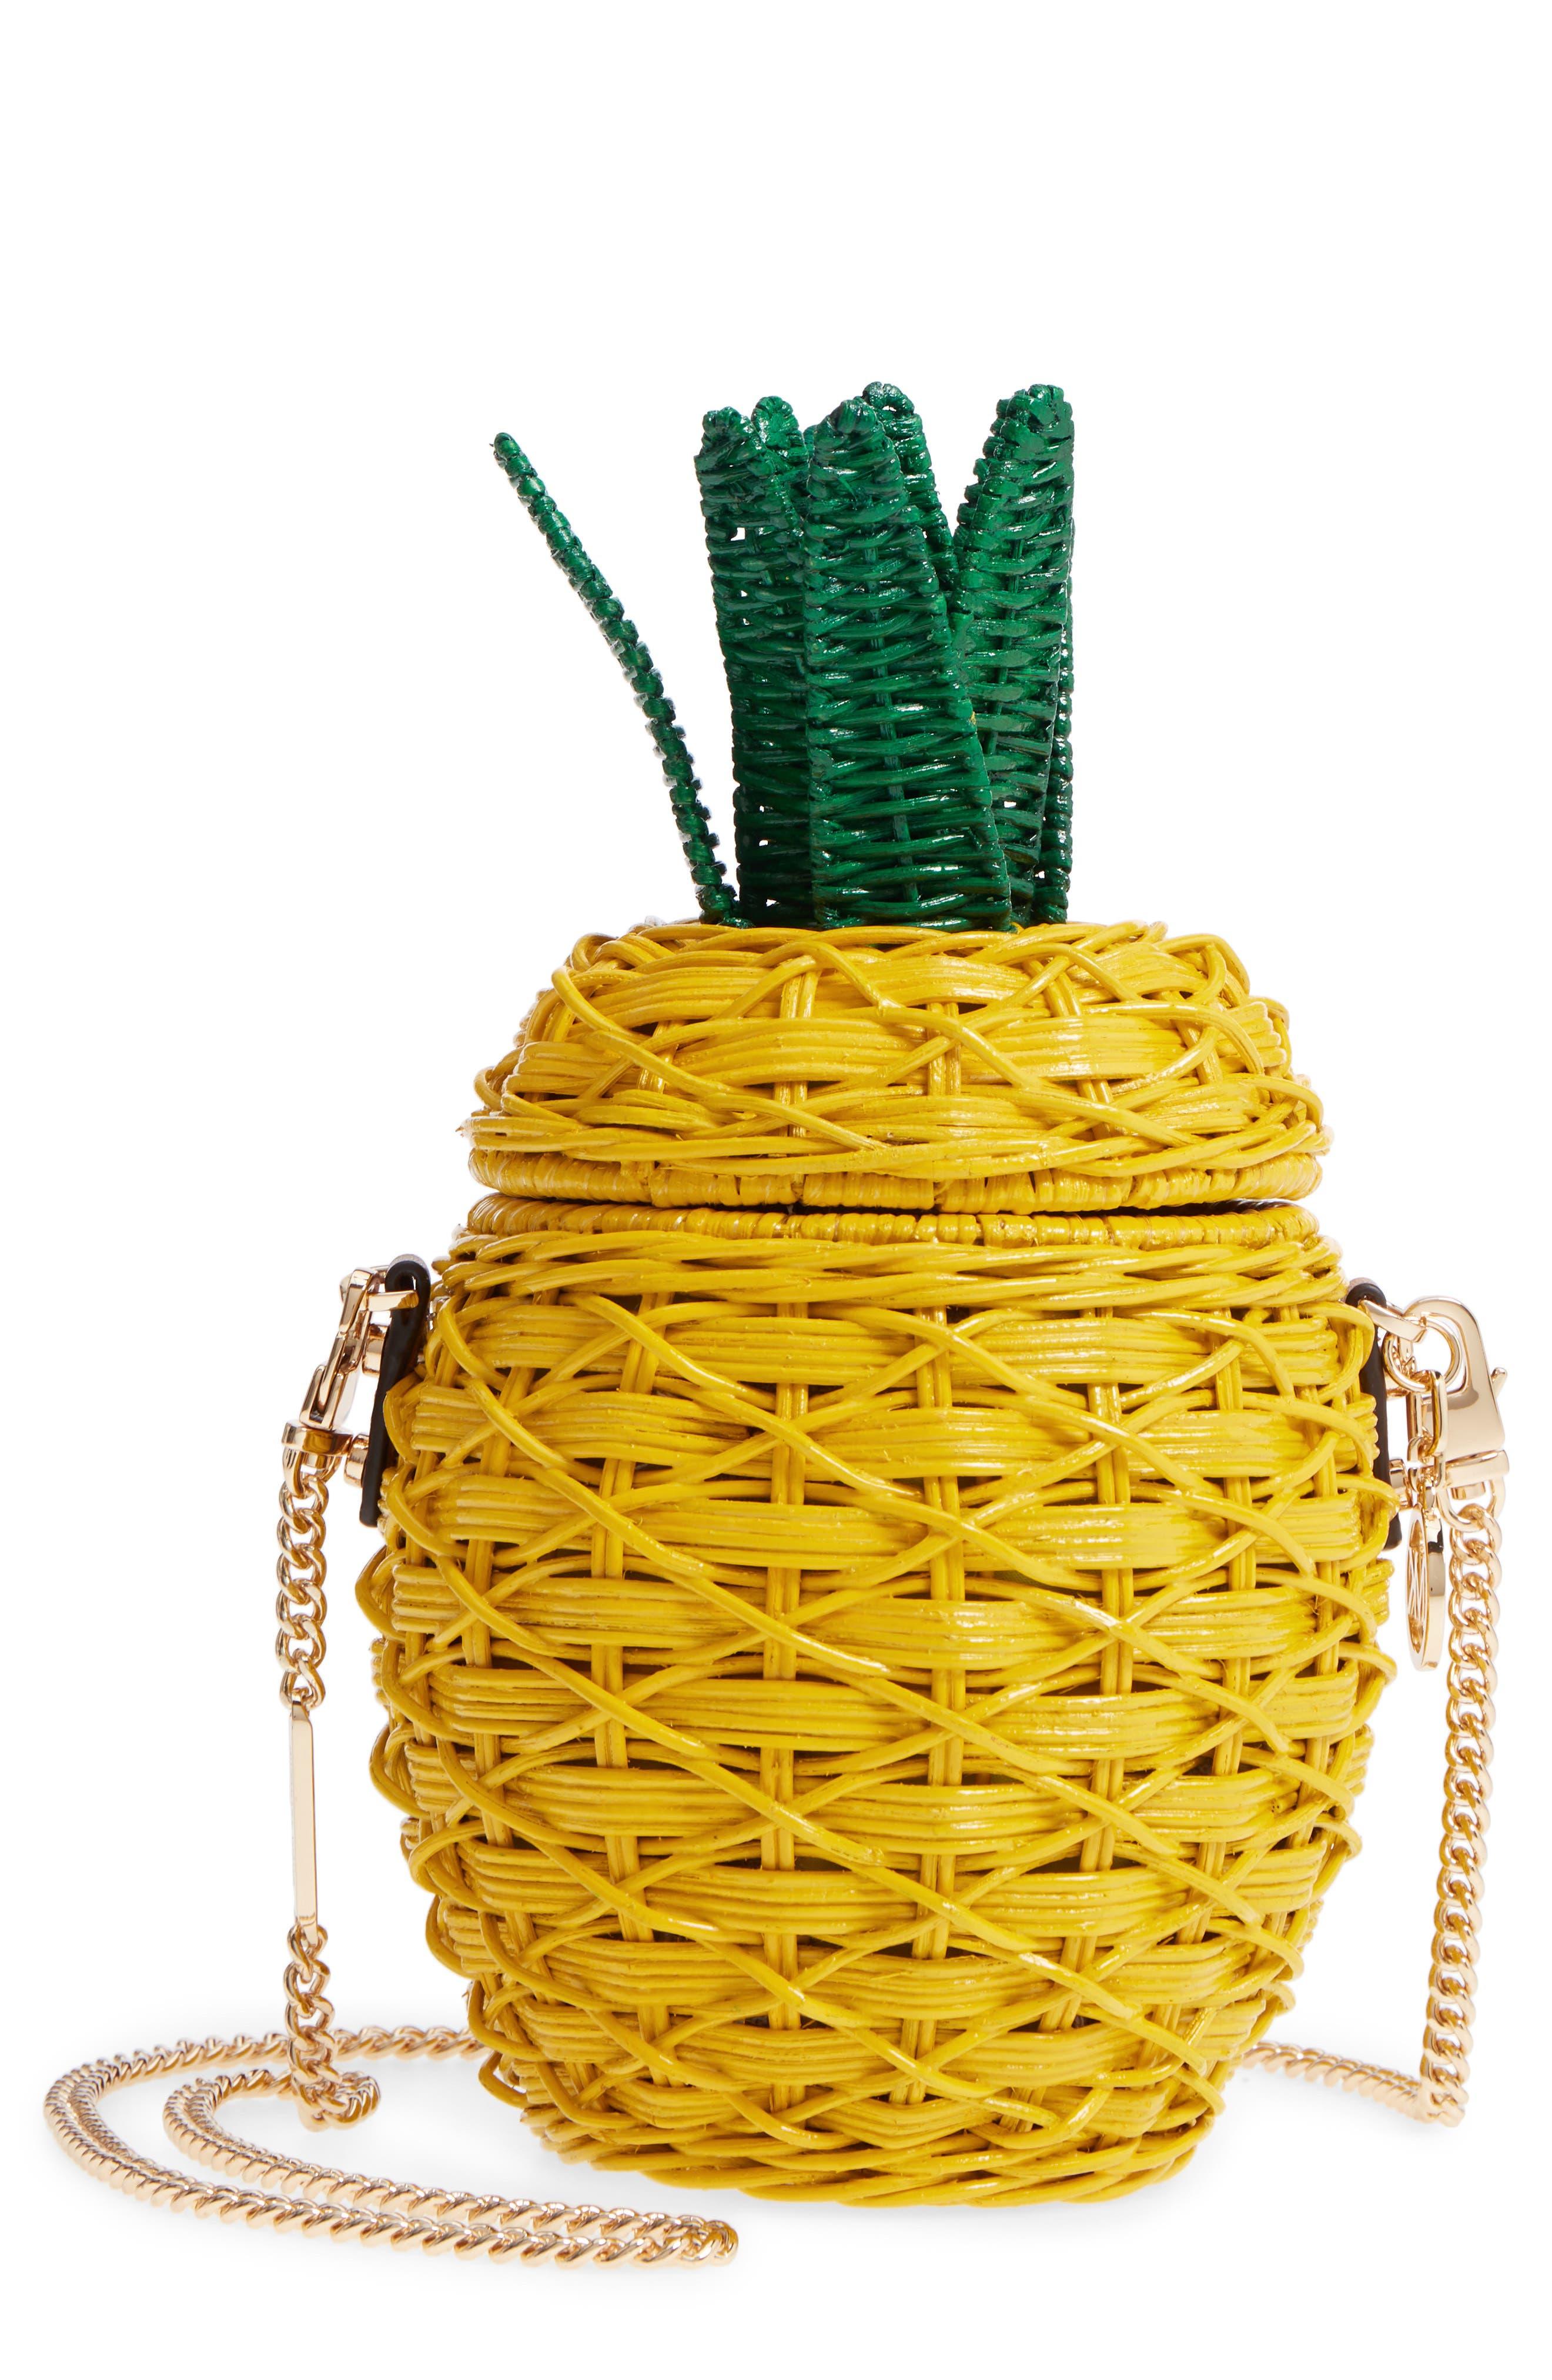 MICHAEL Michael Kors Wicker Pineapple Shoulder Bag,                         Main,                         color, Sunflower